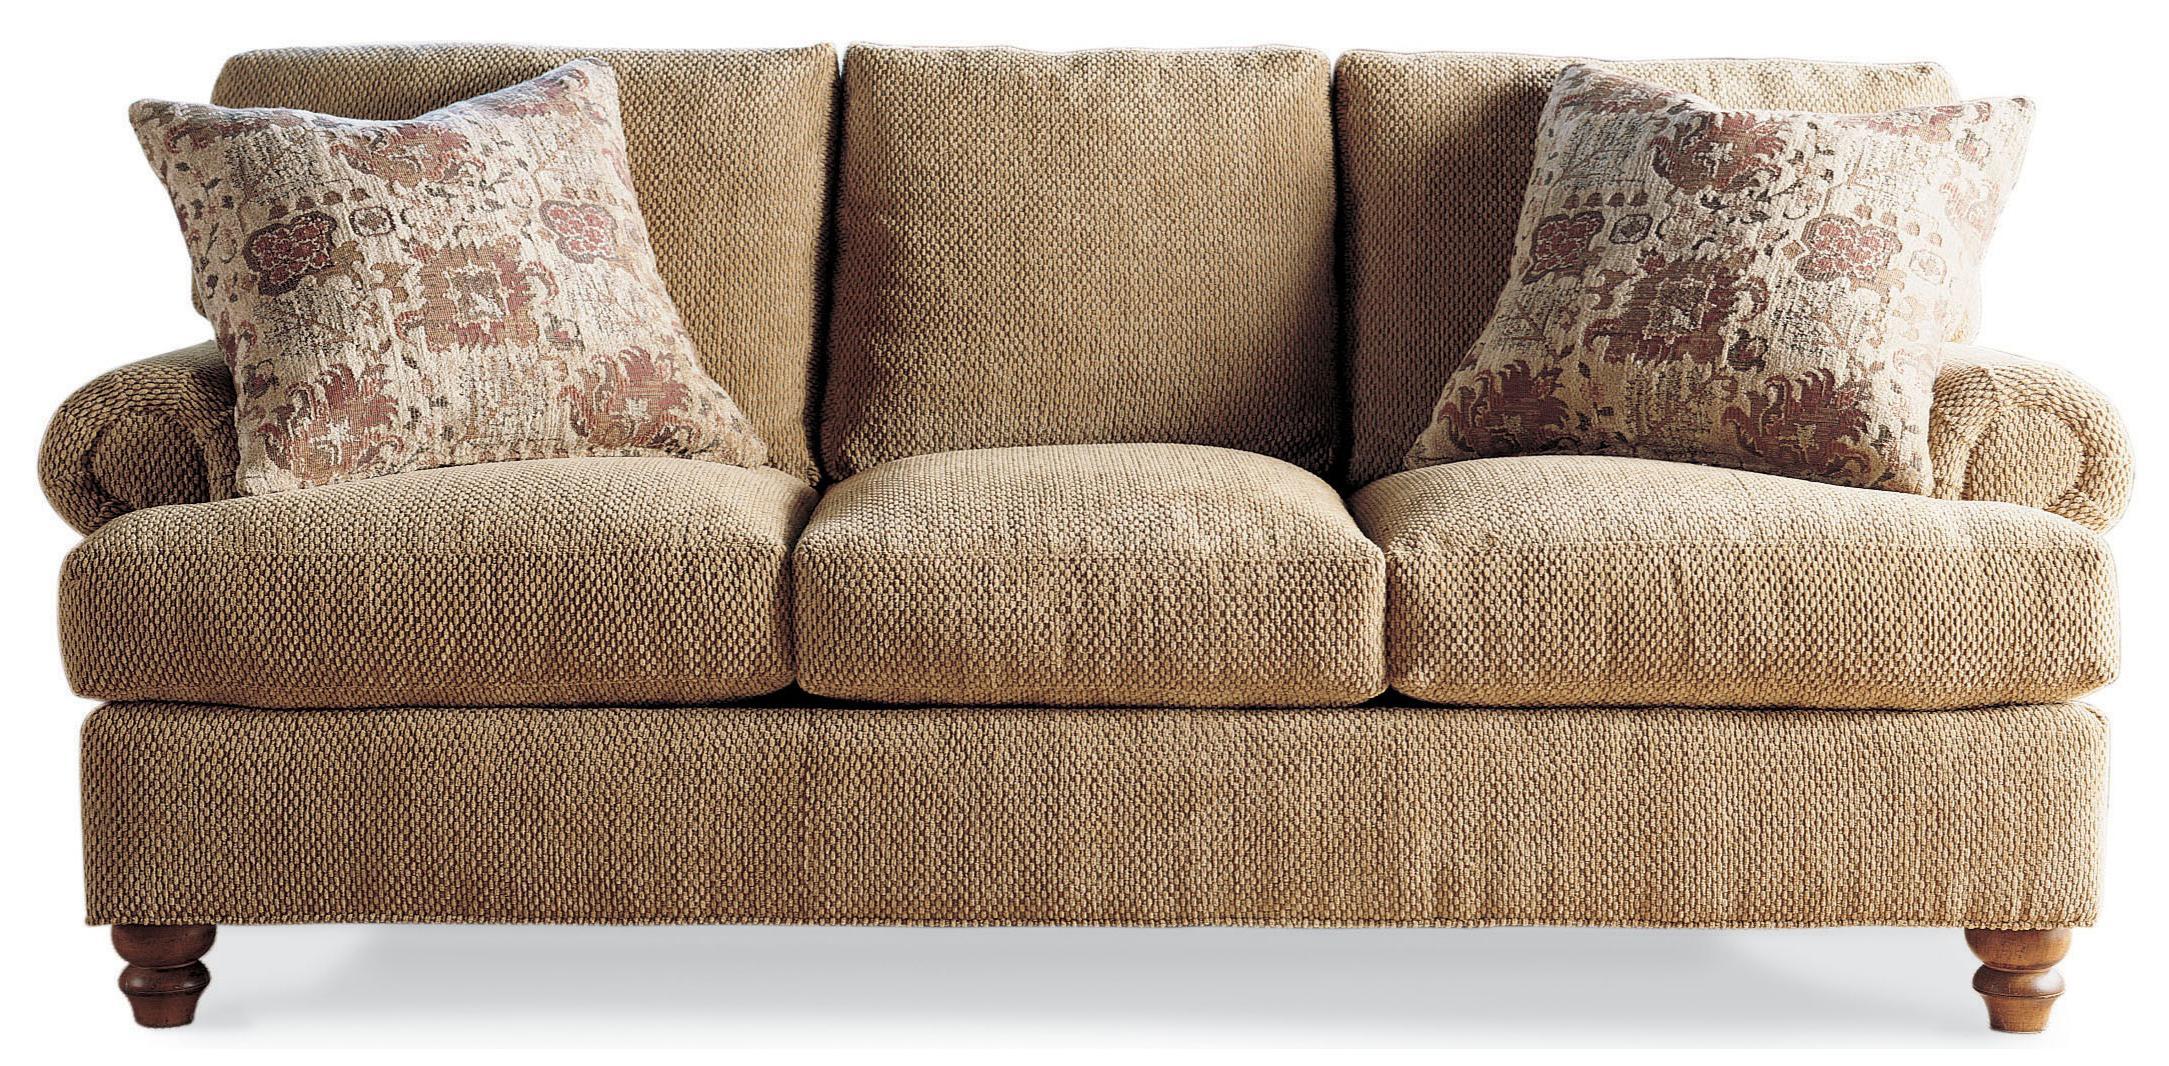 Exceptional Drexel Drexel Heritage UpholsteryMcDermott Sofa ...